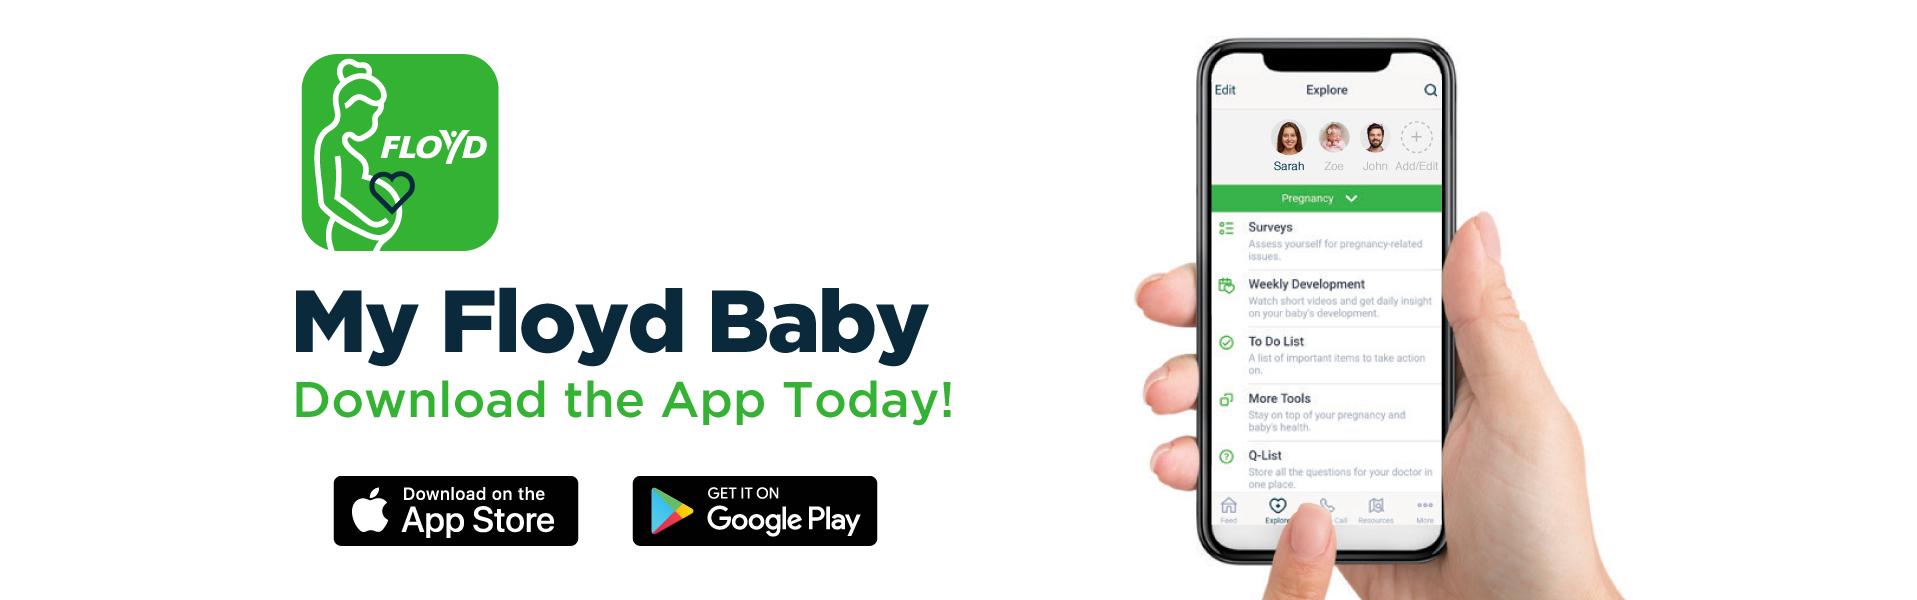 Maternity My Floyd Baby App